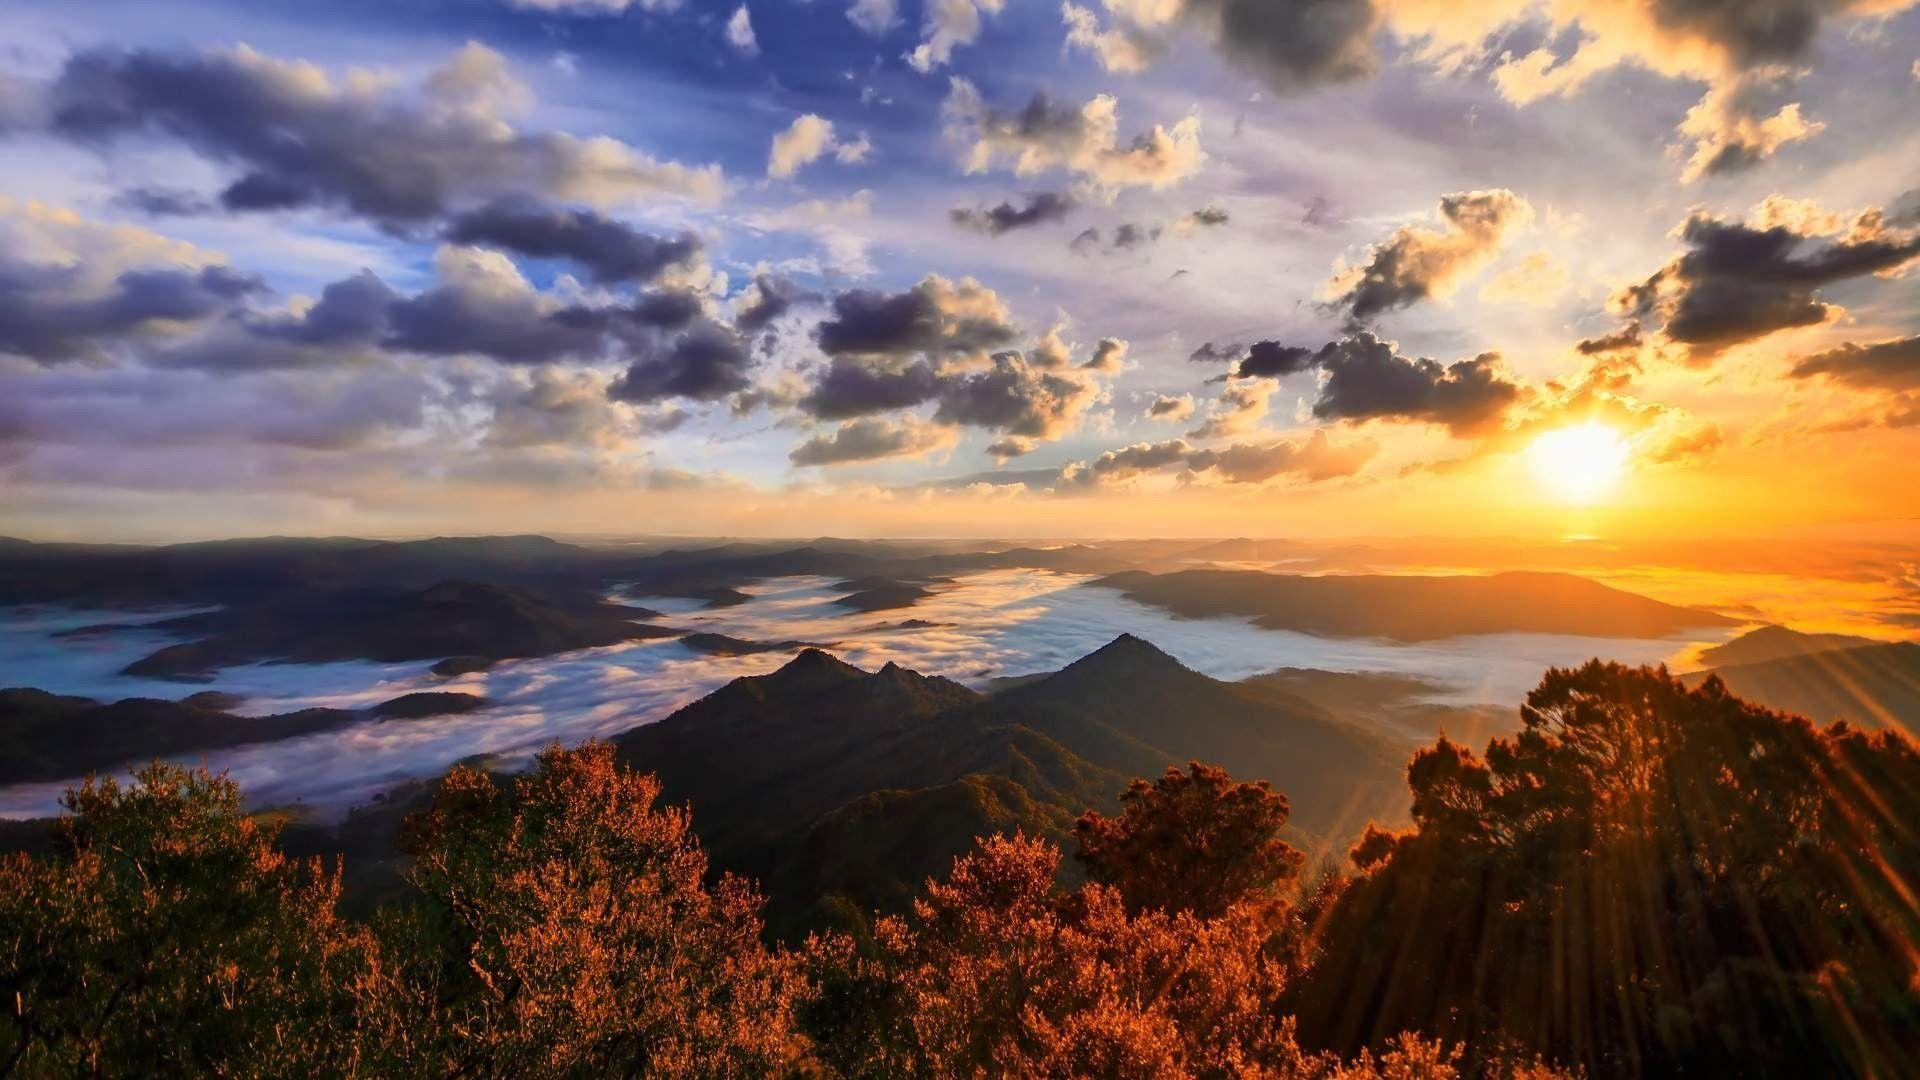 1920x1080 Mountain Sunset Landscape 4k Ultra Hd Wallpaper